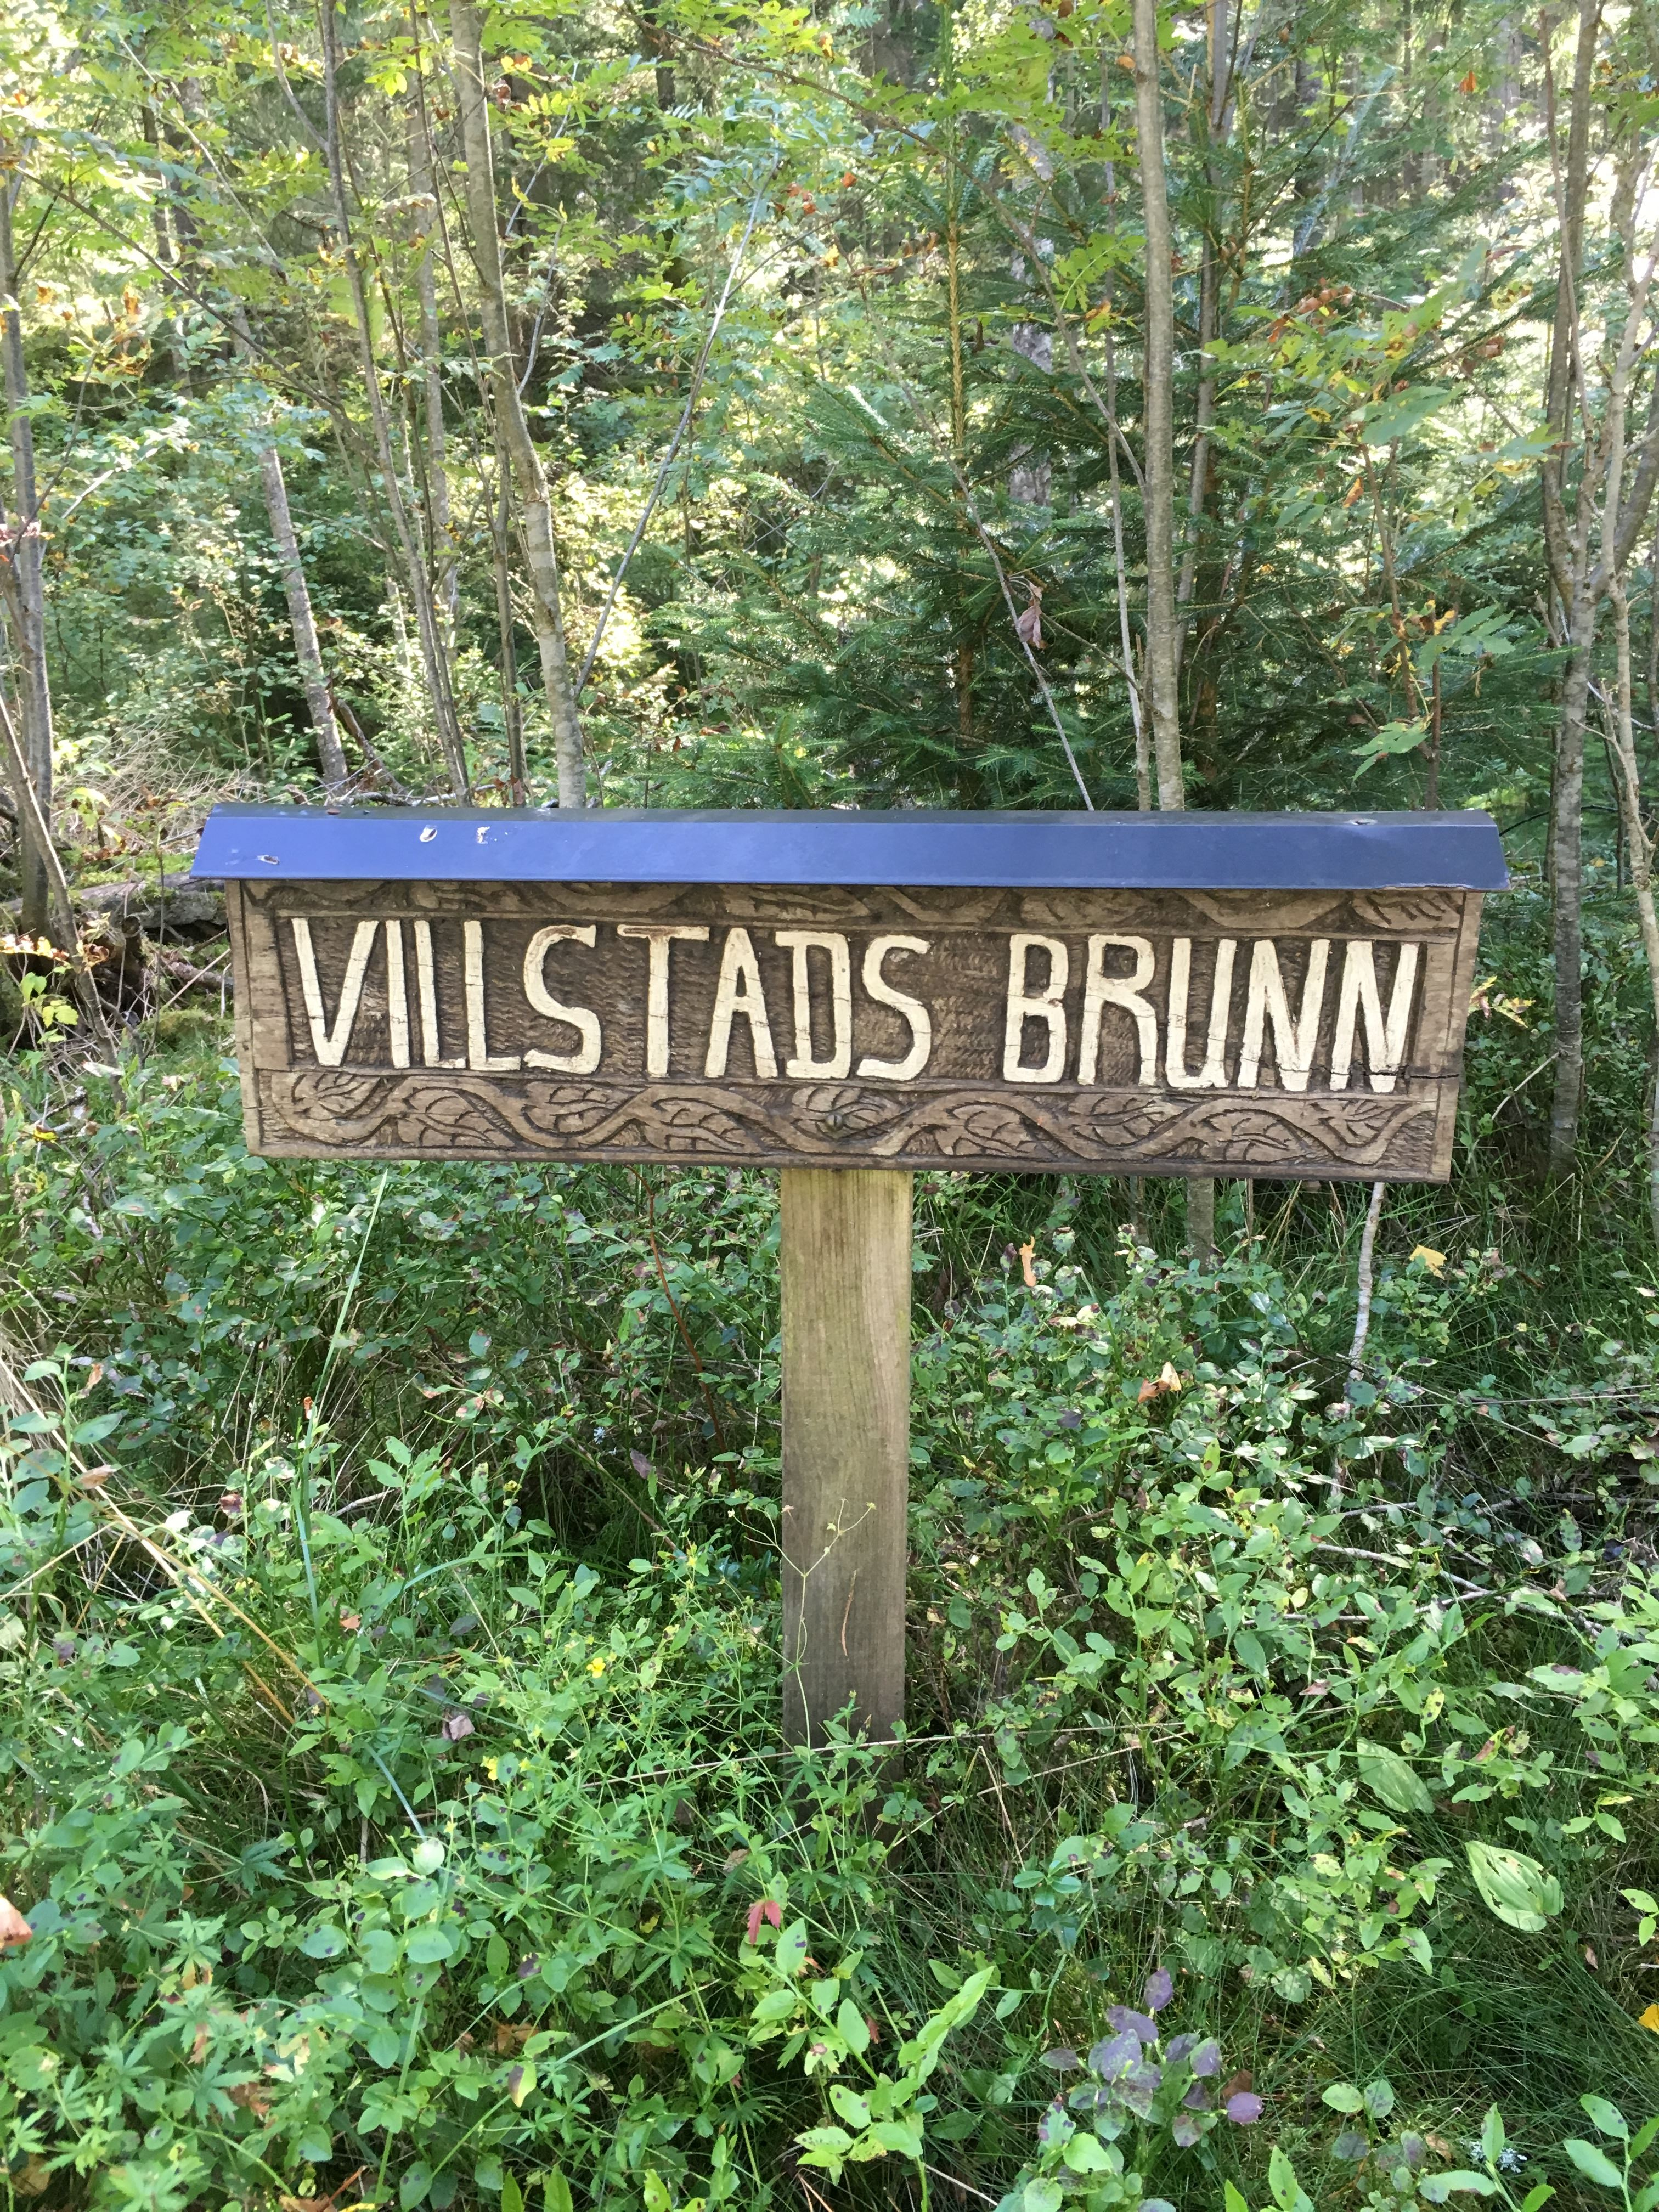 © Gislaveds kommun, Villstad Brunn